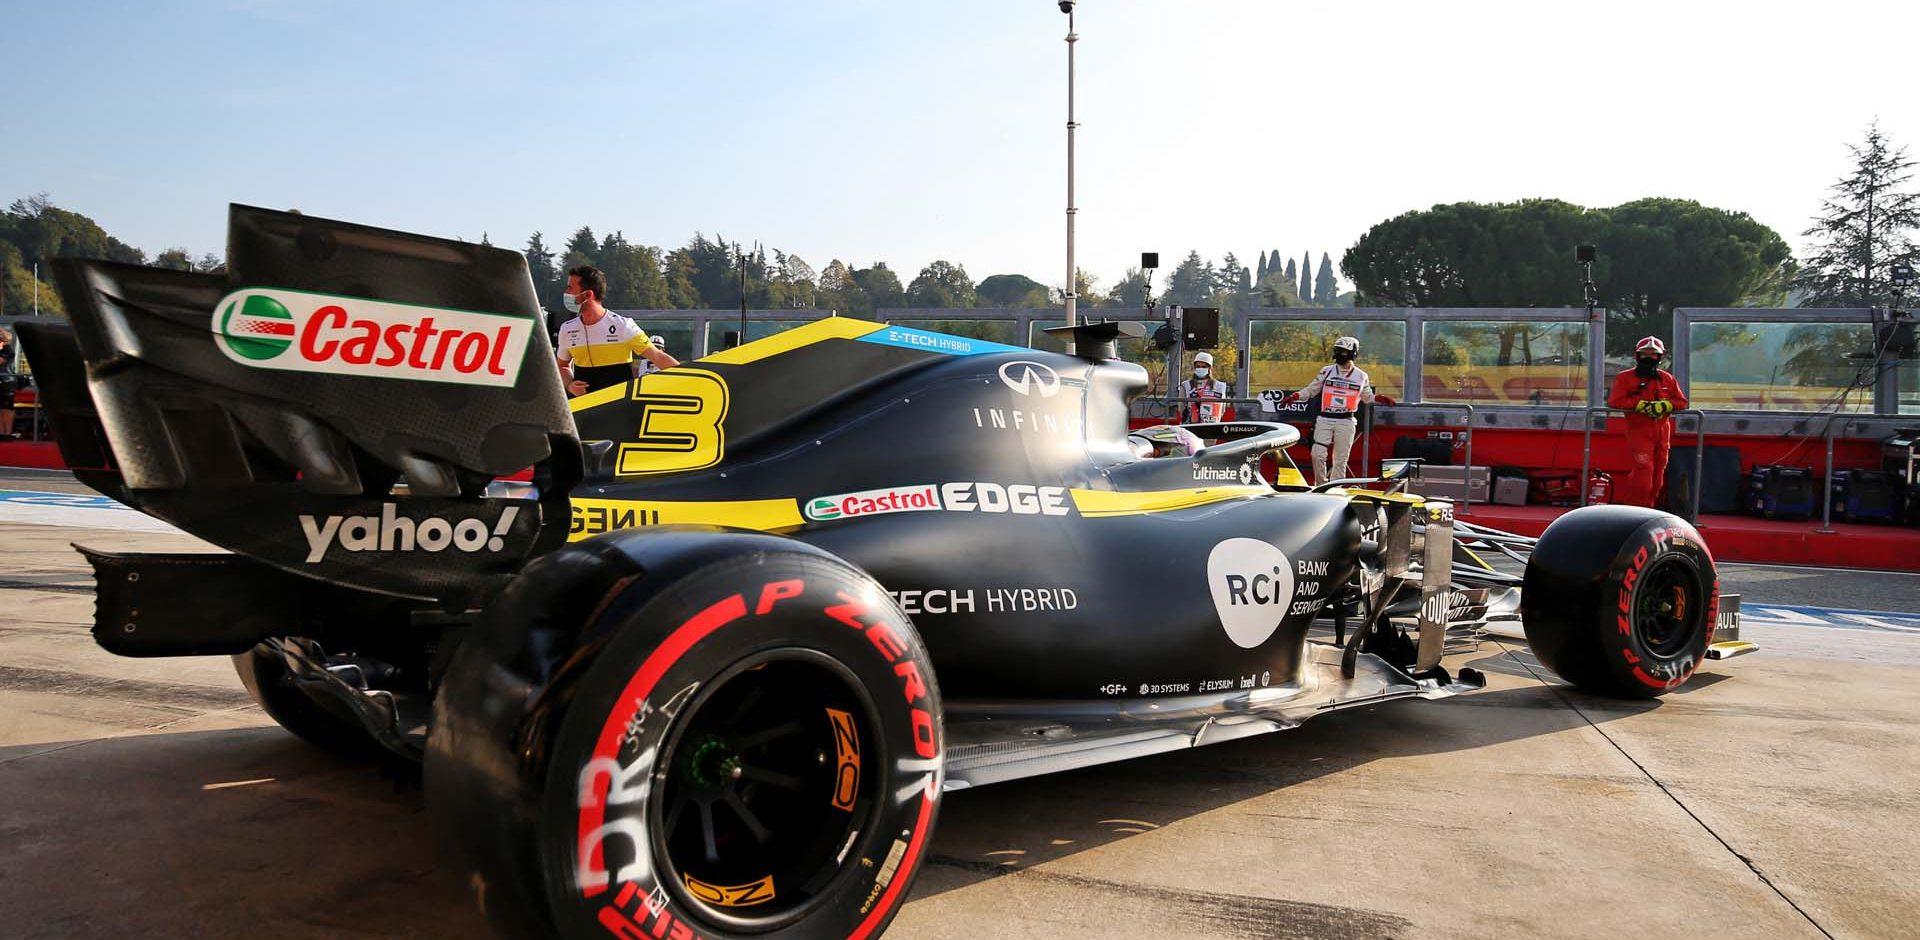 Daniel Ricciardo (AUS) Renault F1 Team RS20 leaves the pits. Emilia Romagna Grand Prix, Saturday 31st October 2020. Imola, Italy.